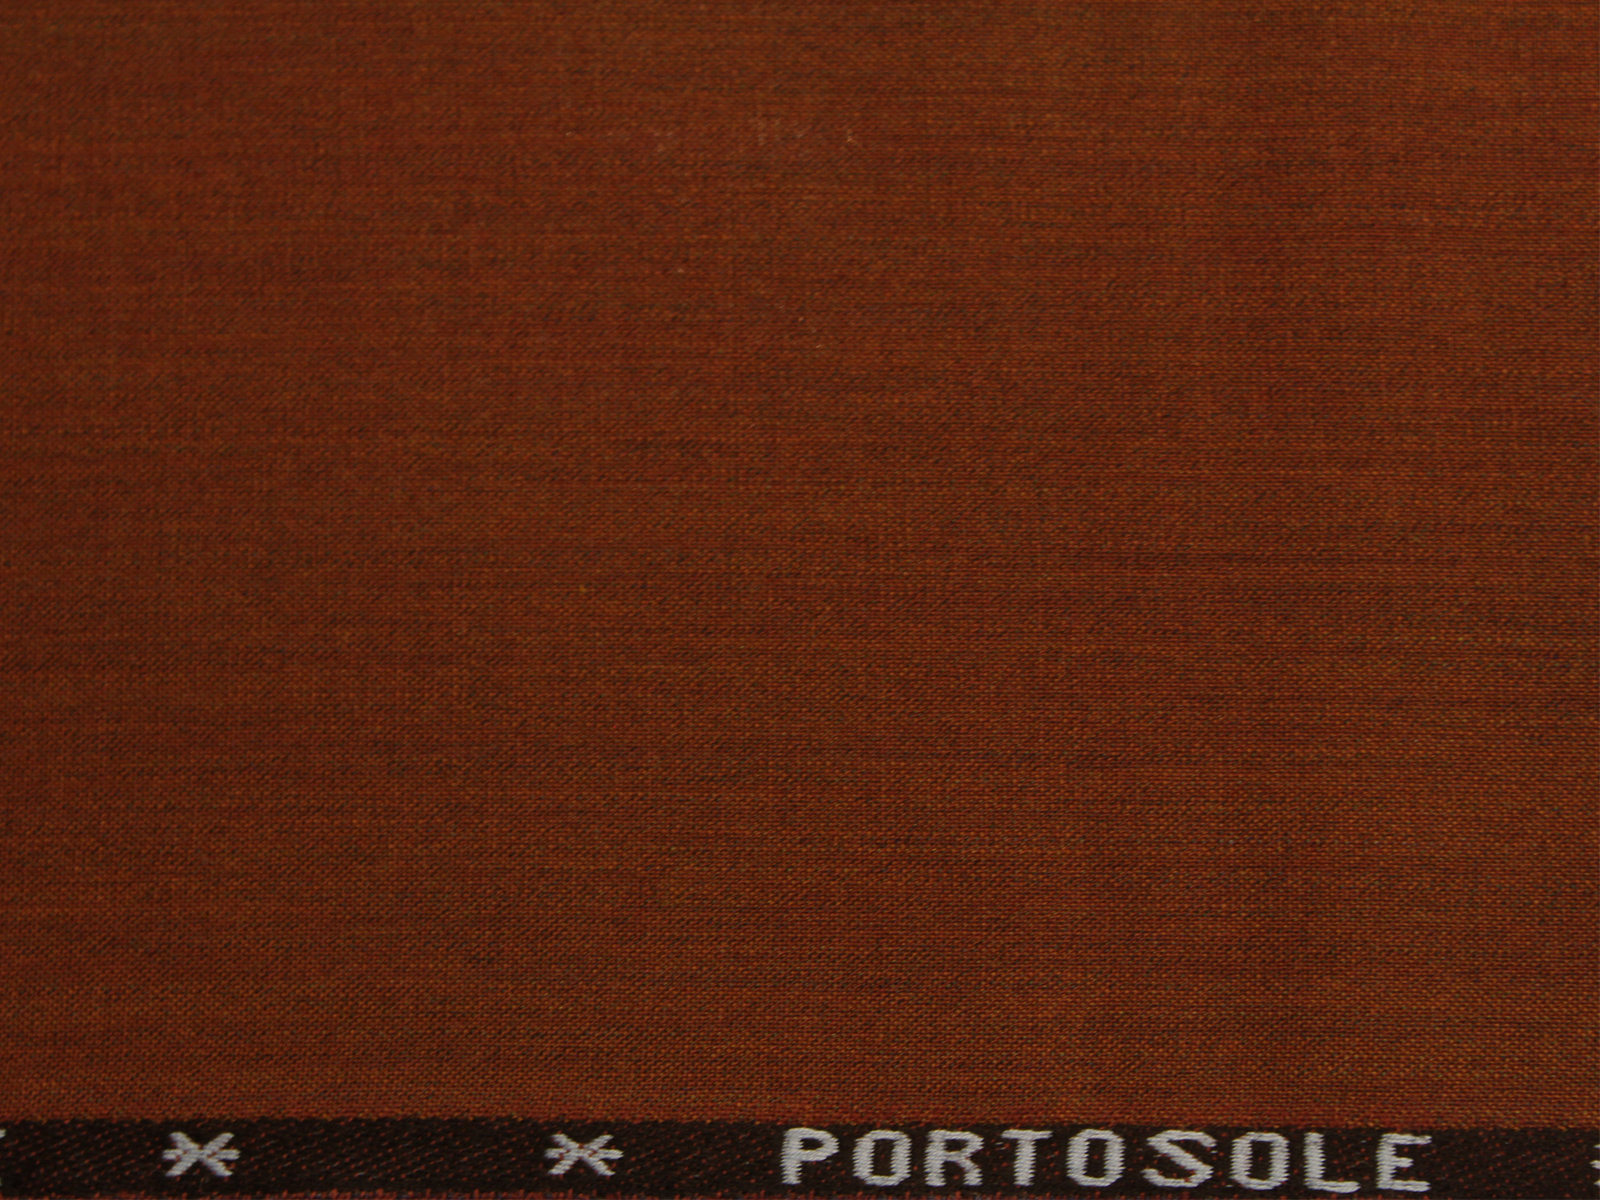 00491 Fresco lana Portosole   Cioccolato